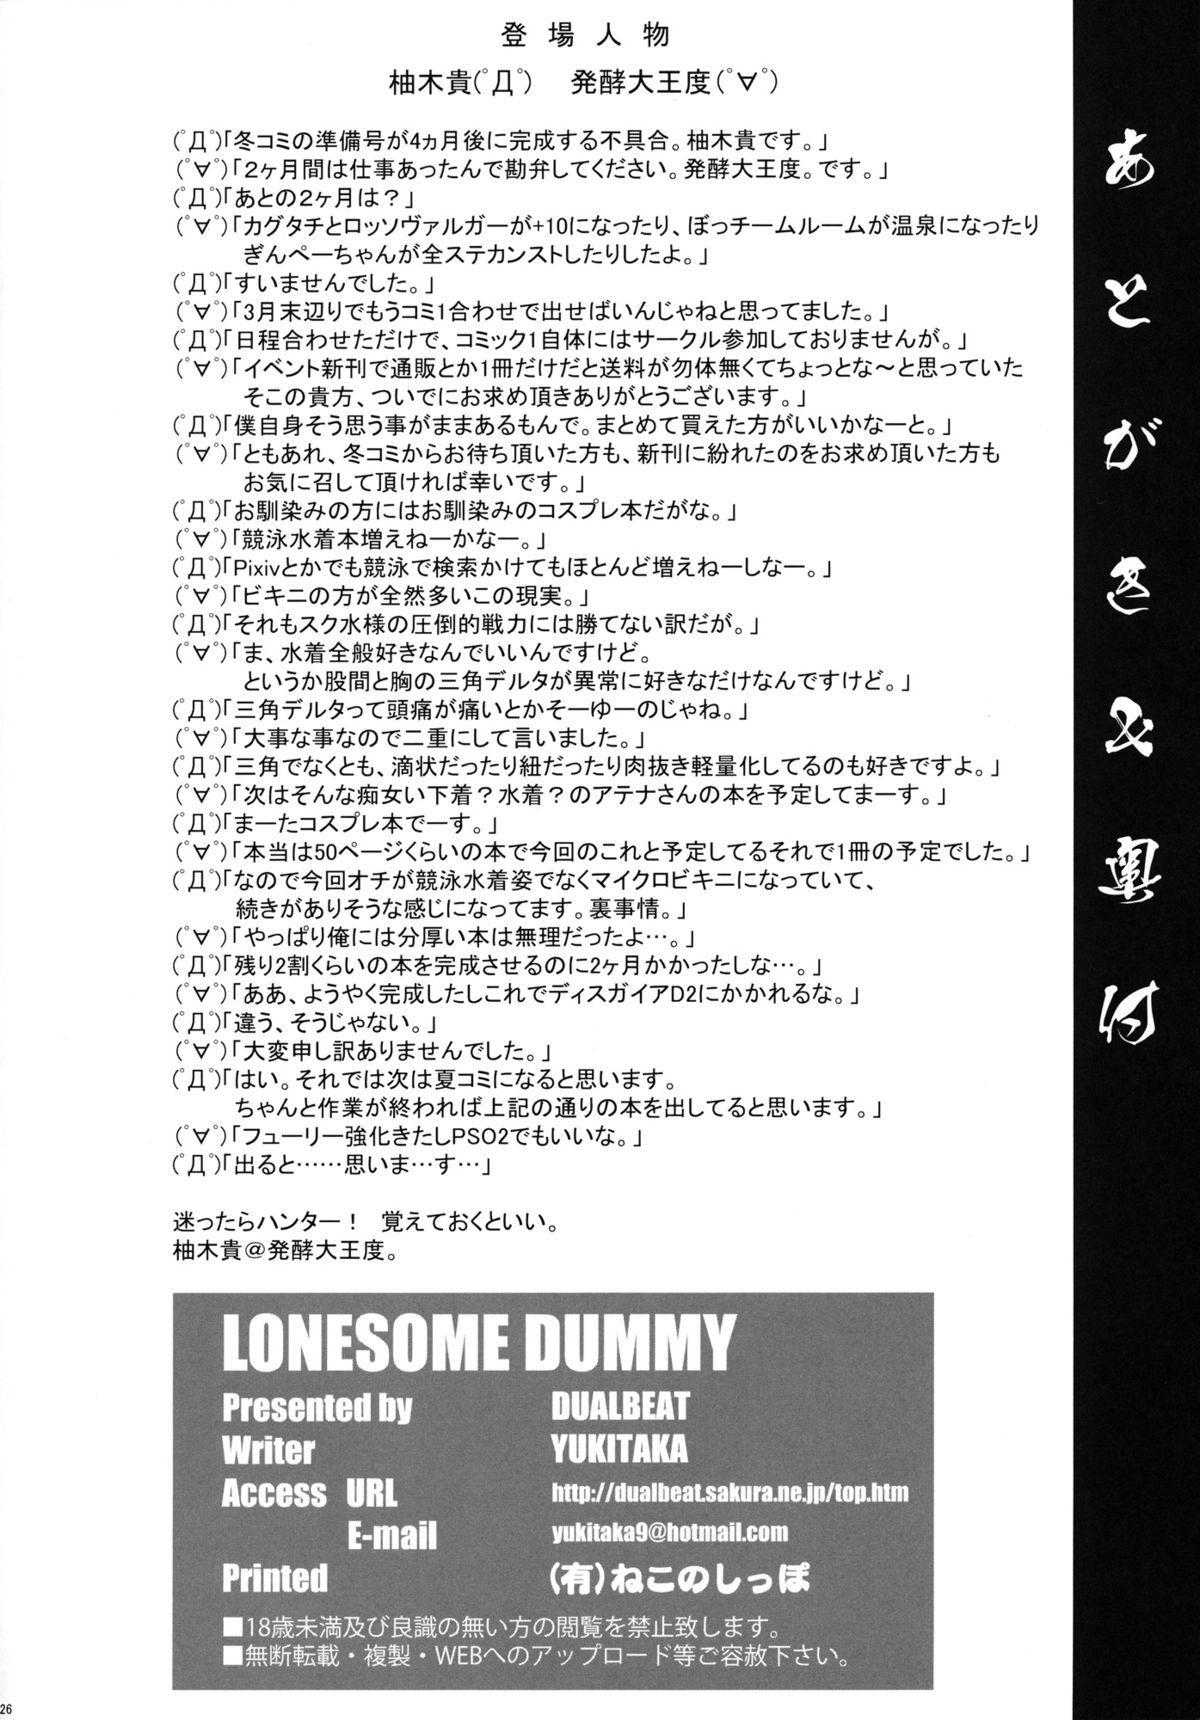 LONESOME DUMMY 24